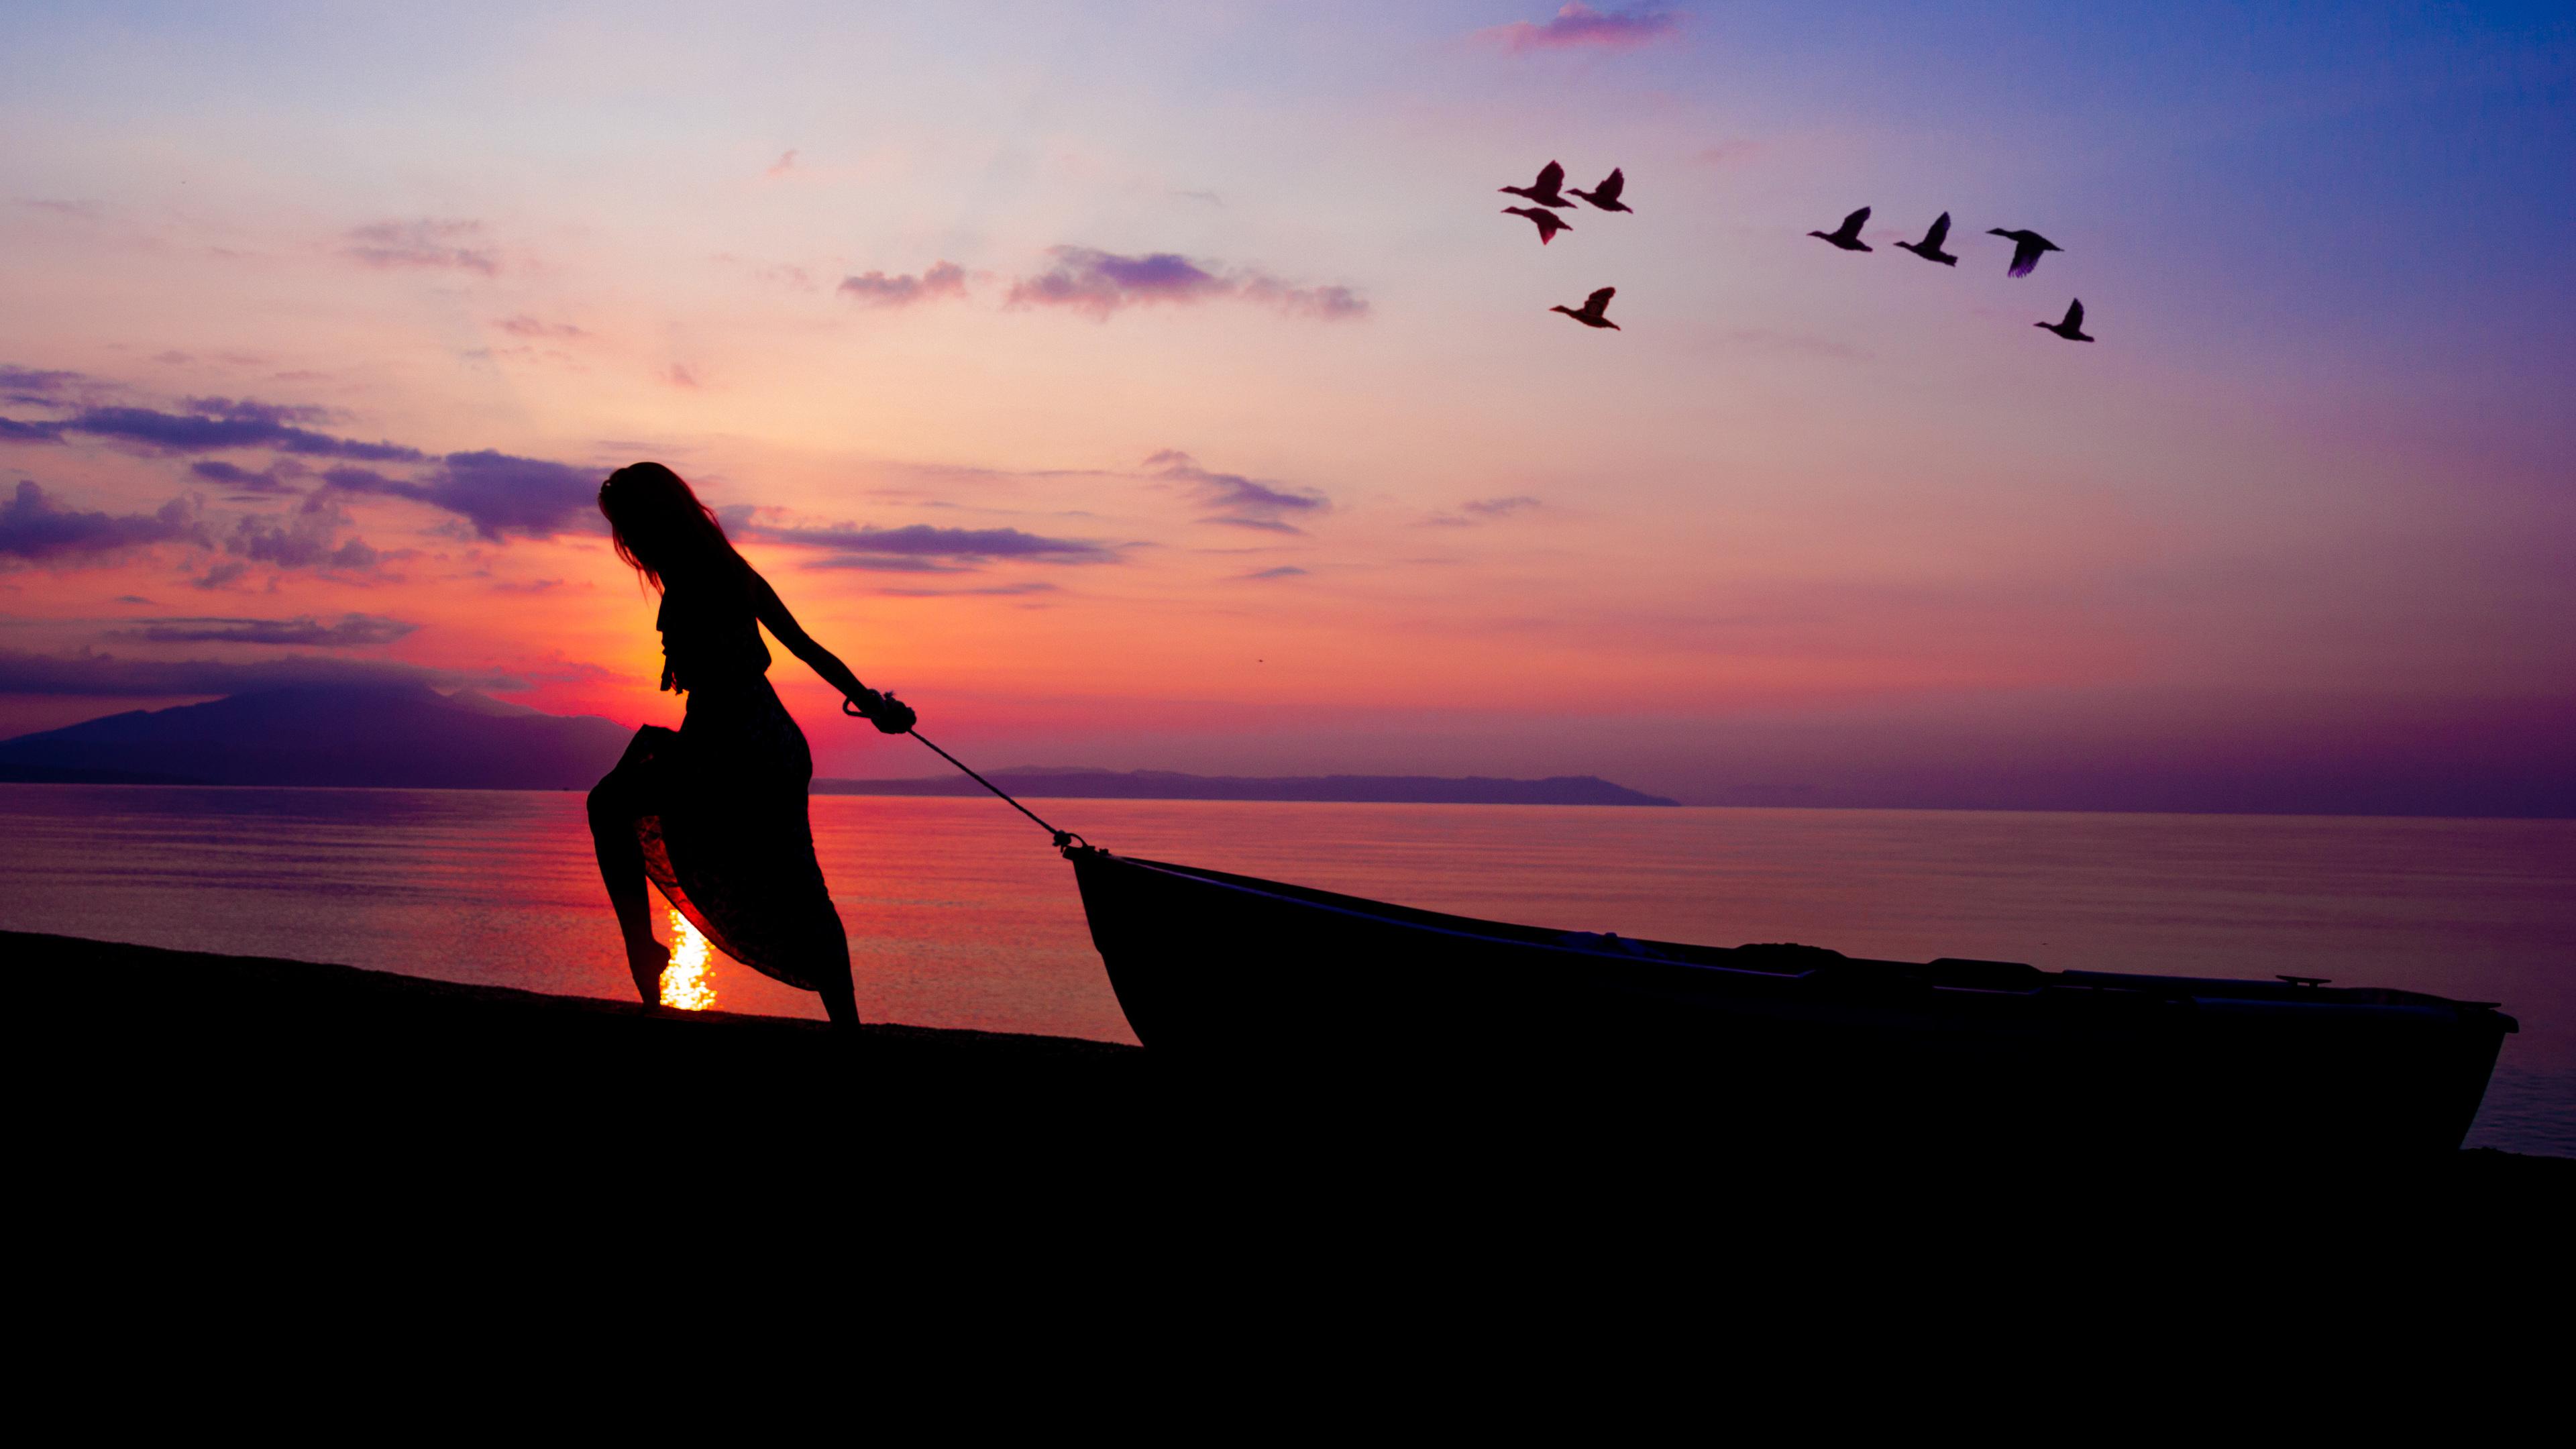 women towing boat beach sunset silhouette 4k 1540136240 - Women Towing Boat Beach Sunset Silhouette 4k - sunset wallpapers, sunrise wallpapers, silhouette wallpapers, nature wallpapers, hd-wallpapers, dusk wallpapers, dawn wallpapers, boat wallpapers, beach wallpapers, 5k wallpapers, 4k-wallpapers